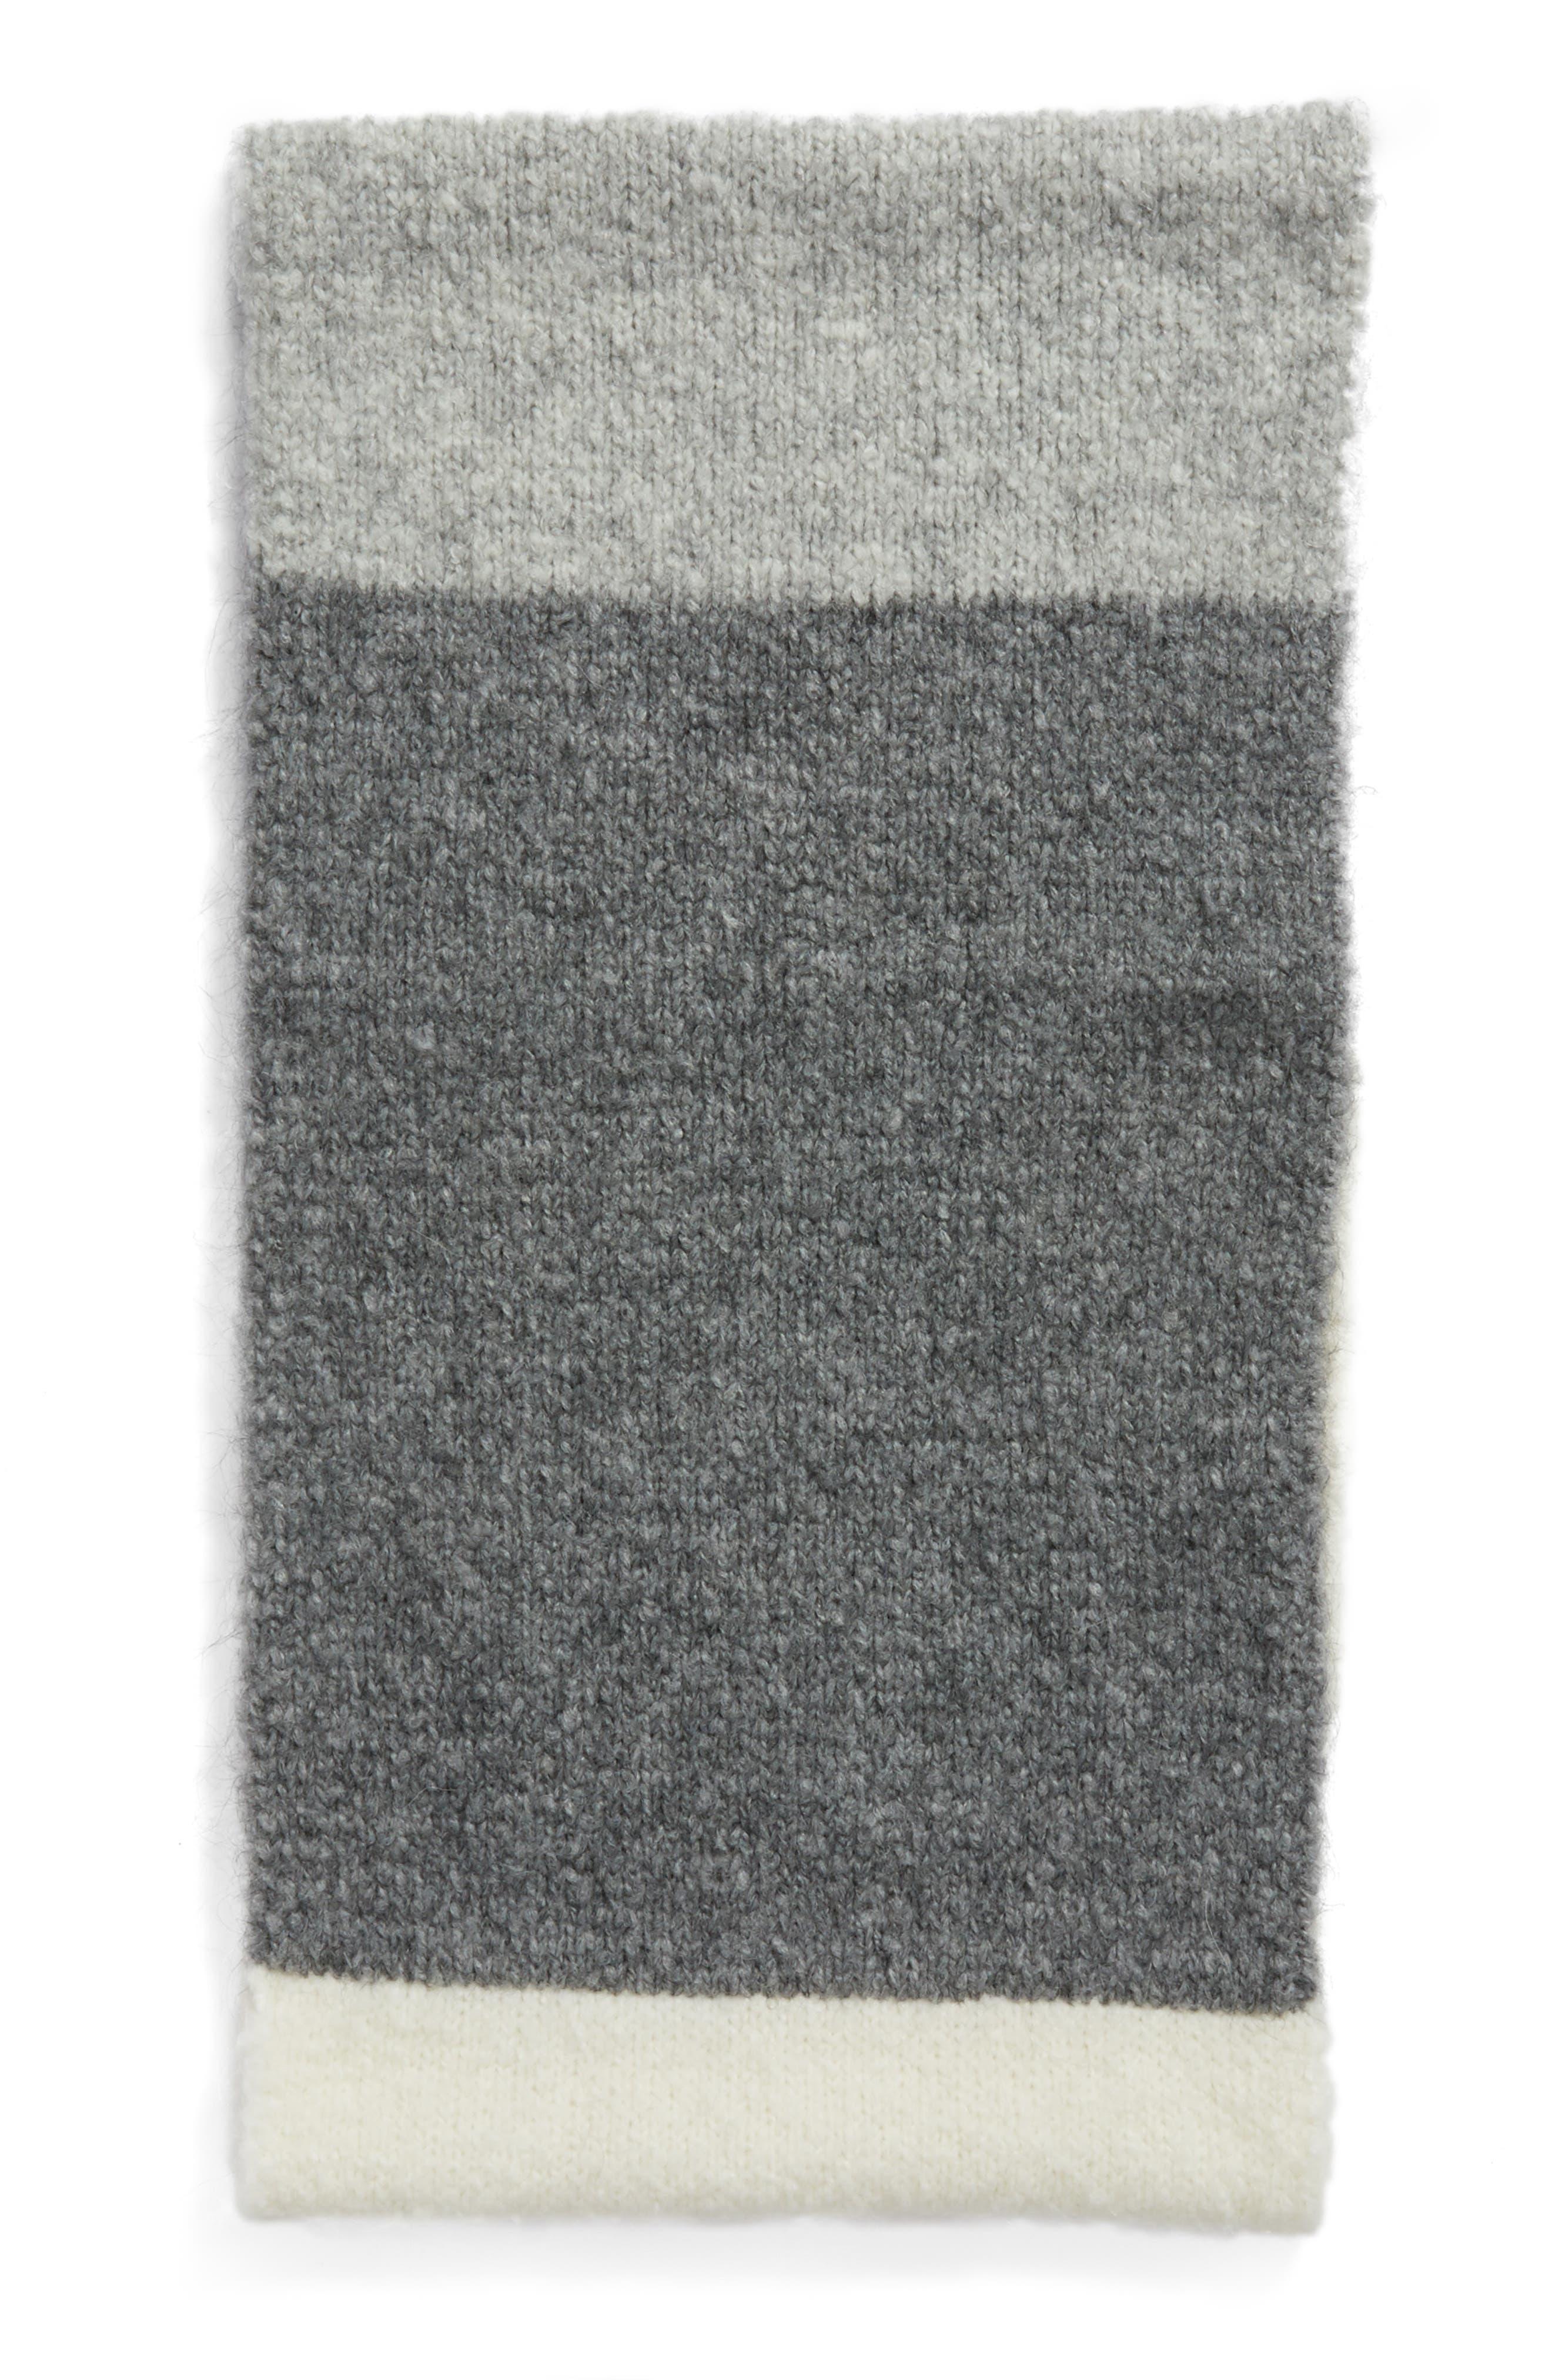 Lofty Tricolor Infinity Scarf,                             Alternate thumbnail 2, color,                             Light Grey M